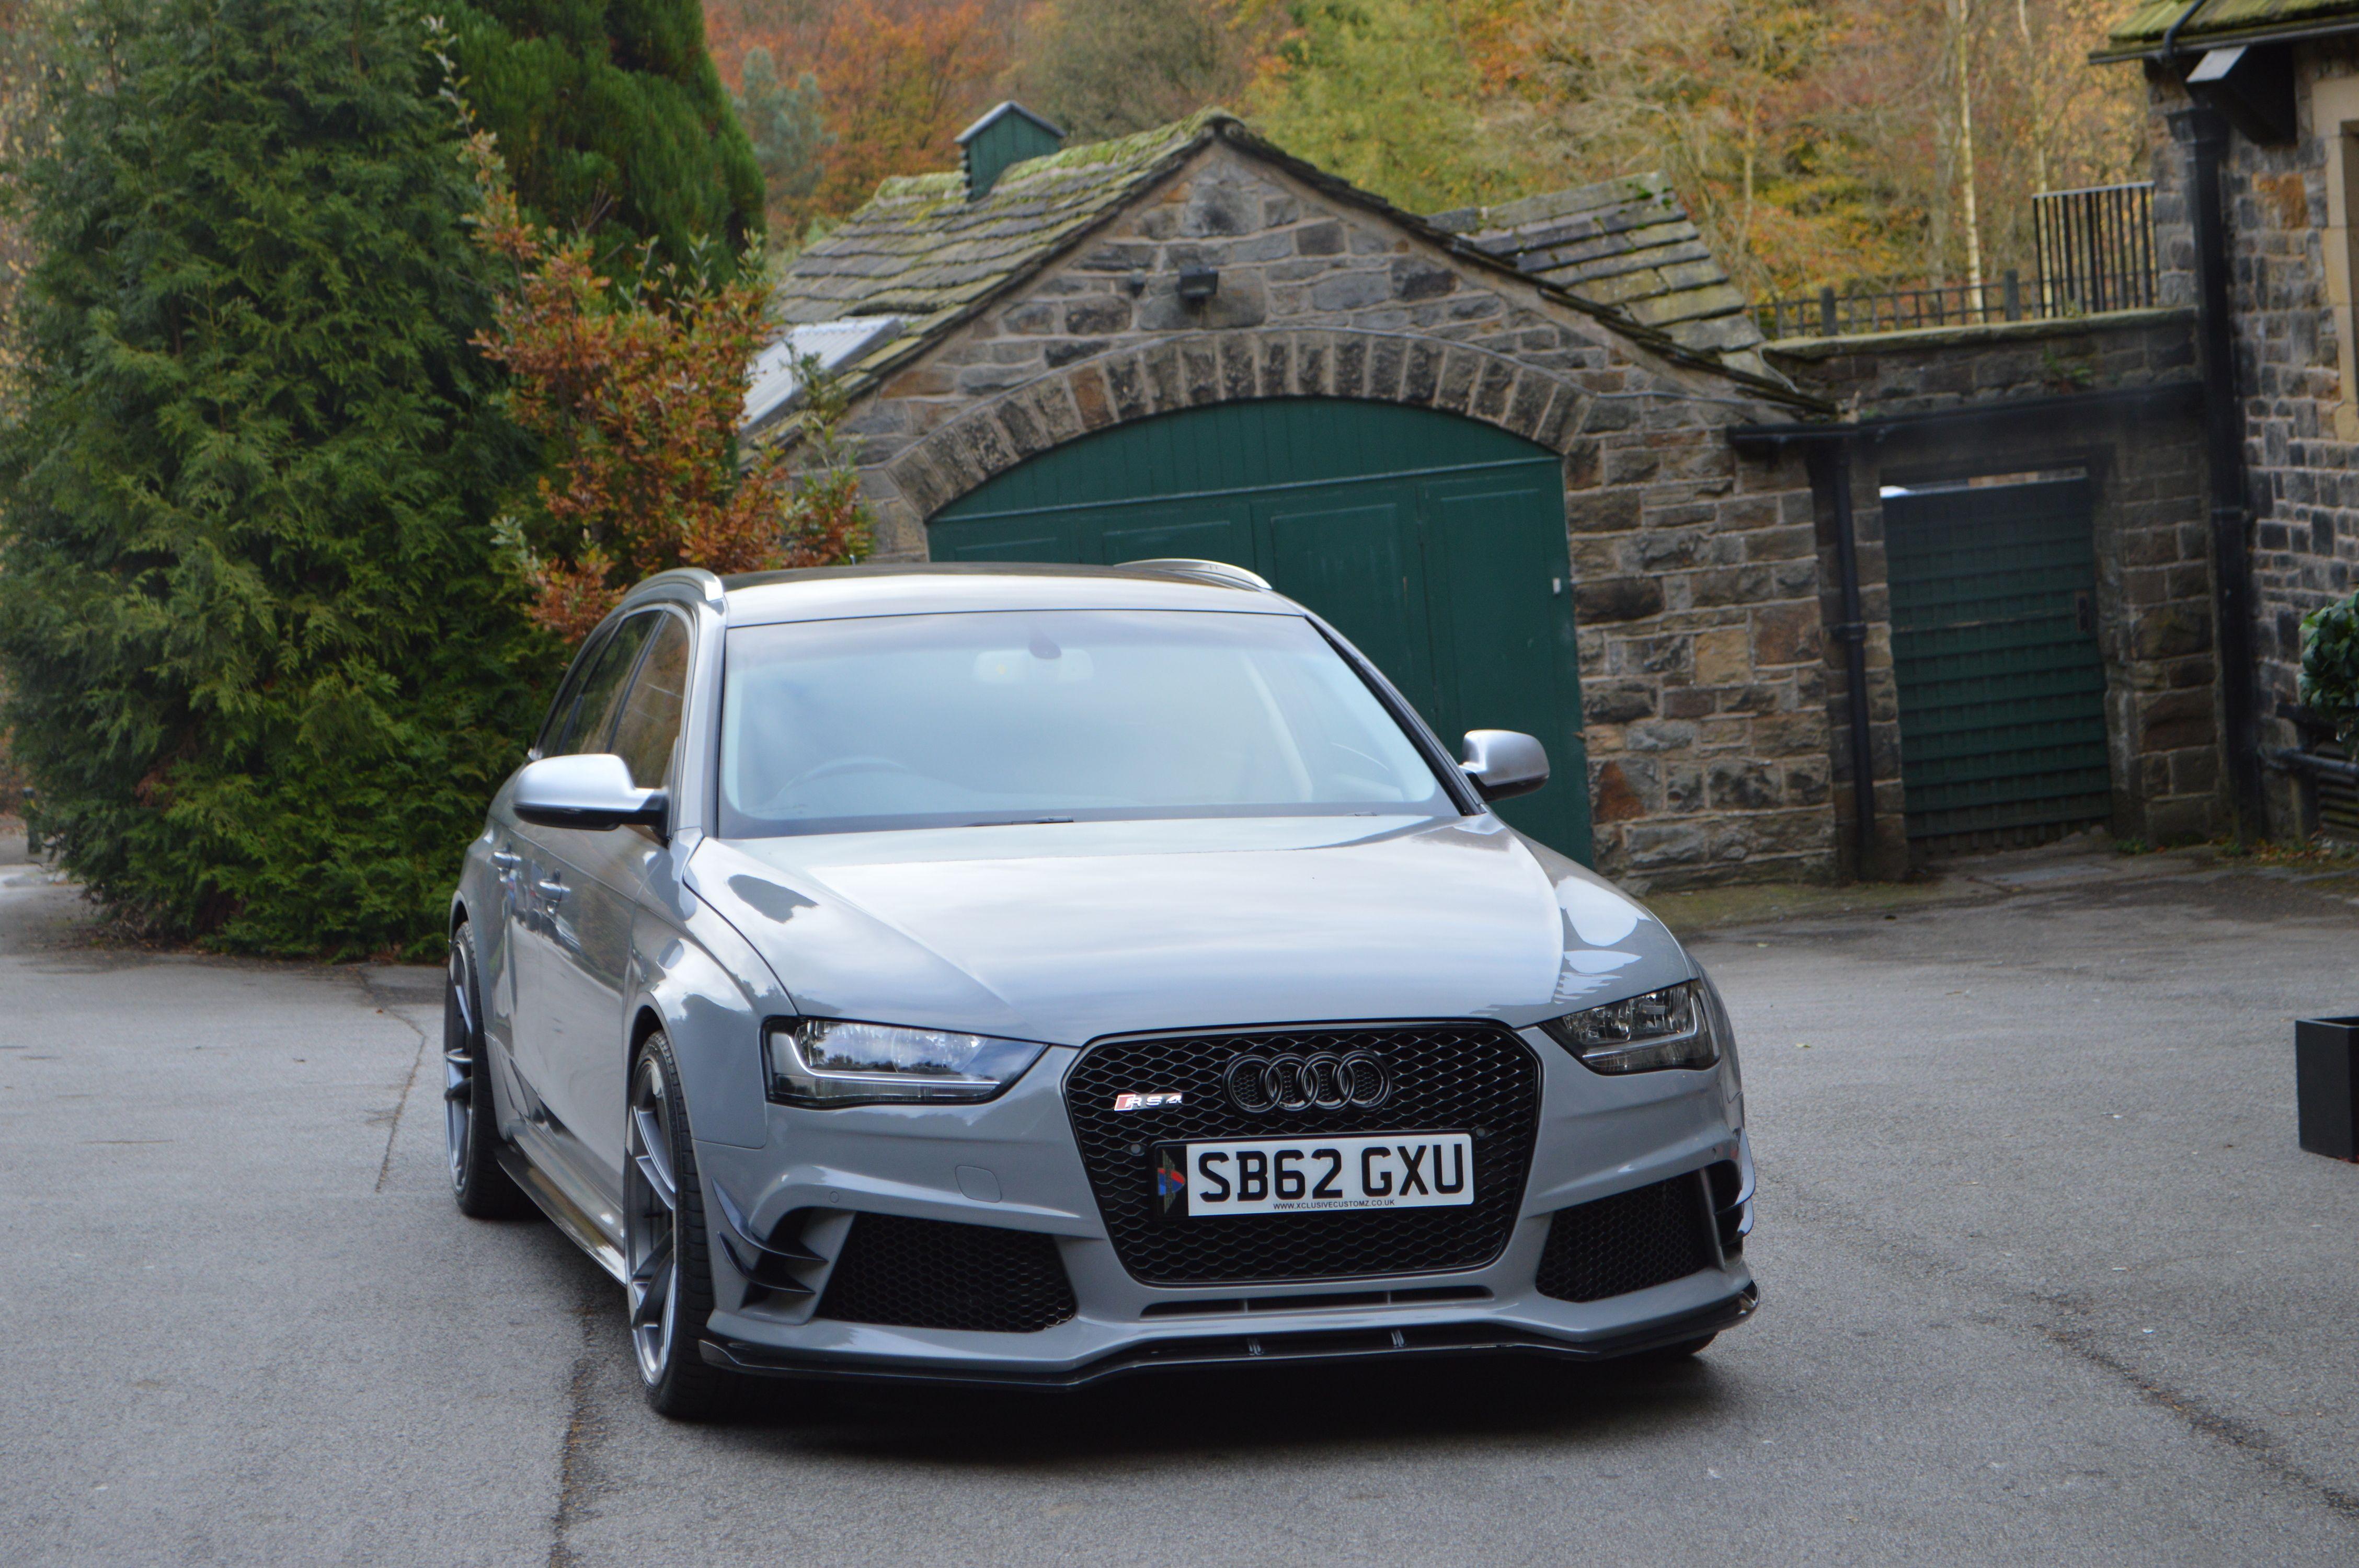 Audi rs4 b8 wide bodykit by xcluisve customz available now for sale scheduled via http www tailwindapp com utm_source pinterest utm_medium twpin